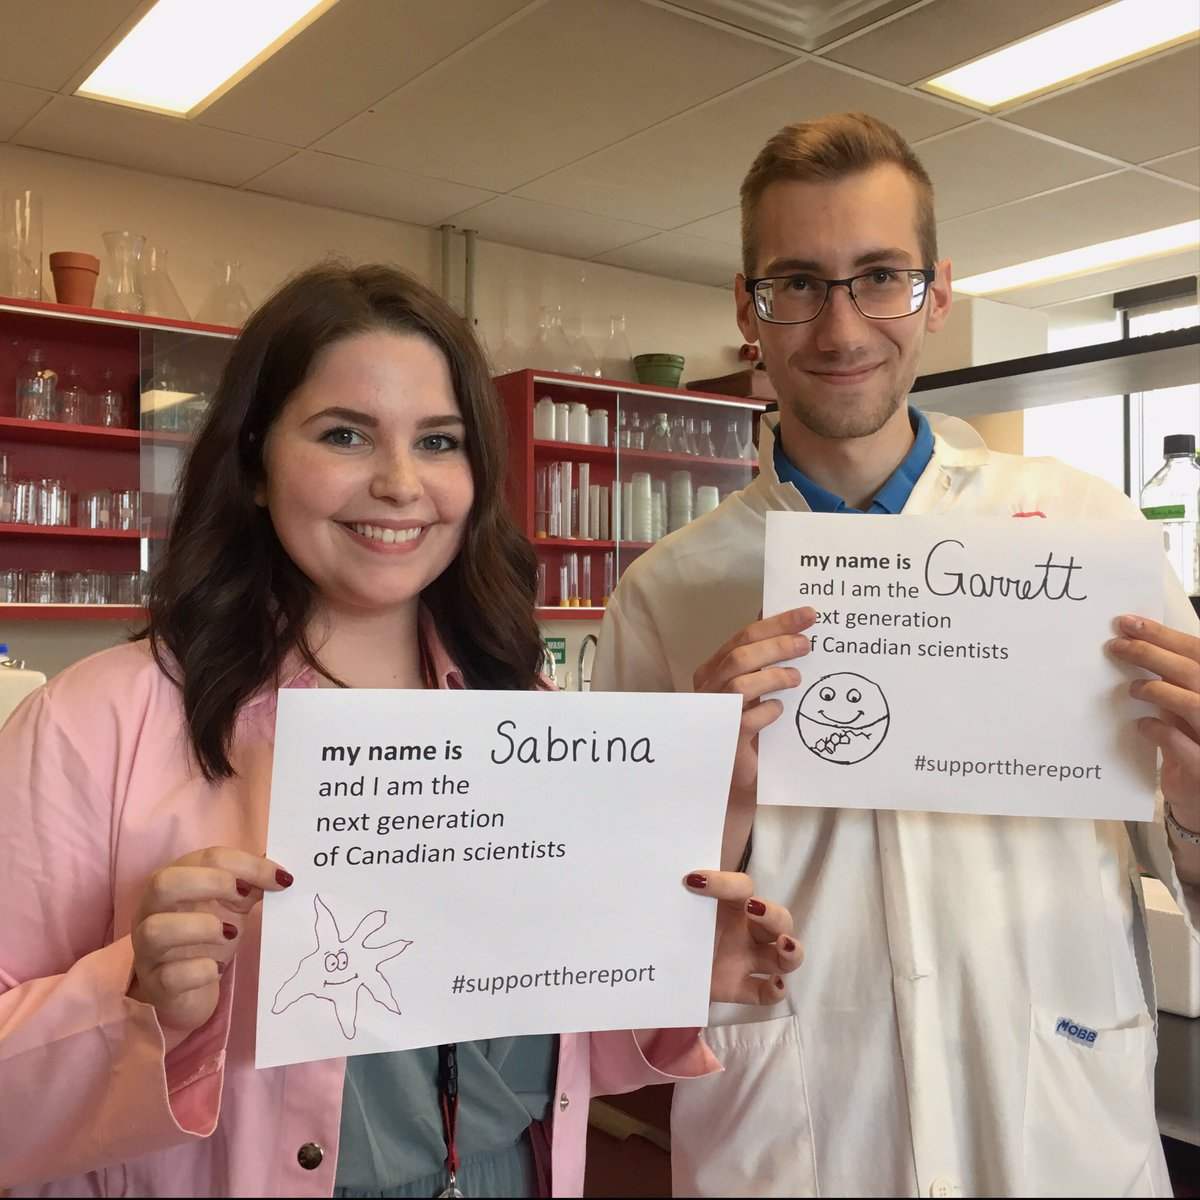 We are the #NextGenCanScience, we study lipid droplet metabolism. #SupportTheReport @JustinTrudeau<br>http://pic.twitter.com/gUJ6SwbiZd